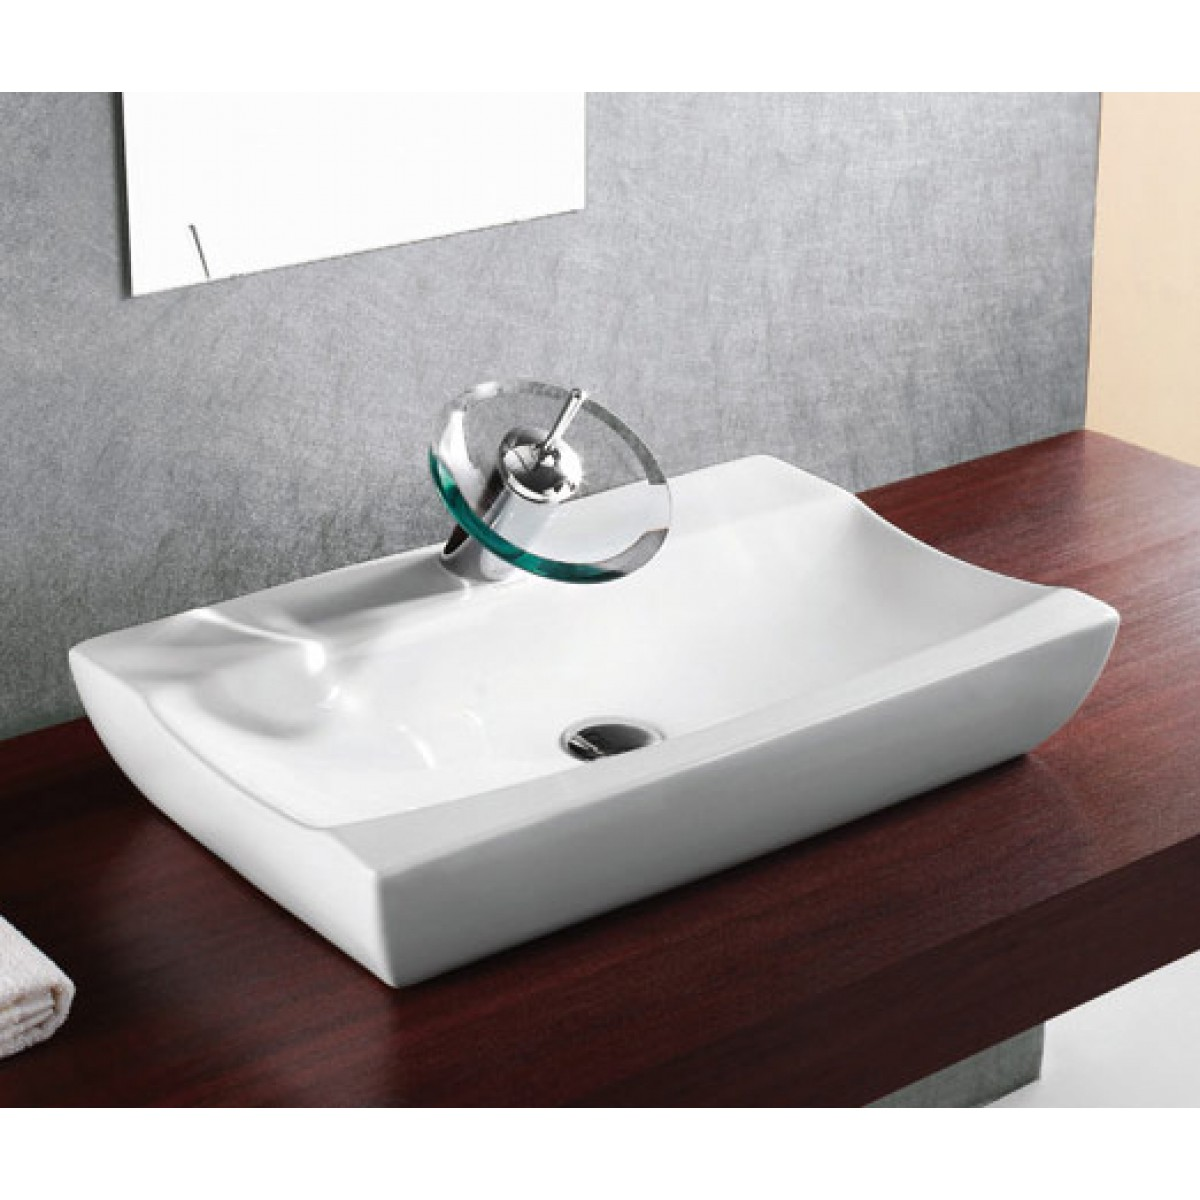 Sink With Countertop: Porcelain Ceramic Single Hole Countertop Bathroom Vessel